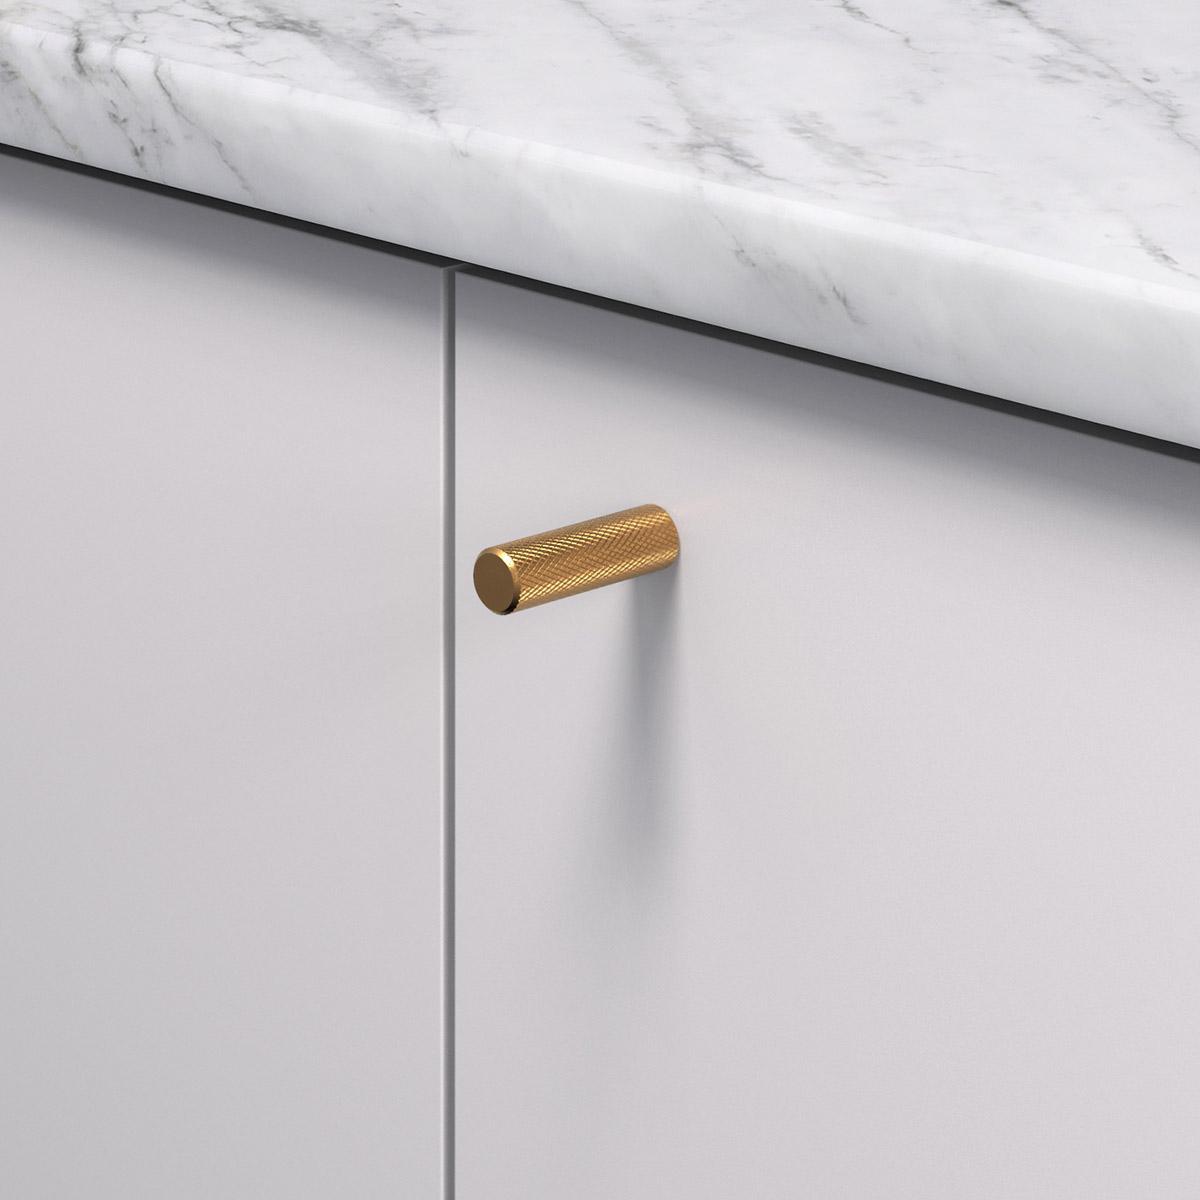 Knopp massing 370225 11 10 mm ncs s 3000 n marmor carrara